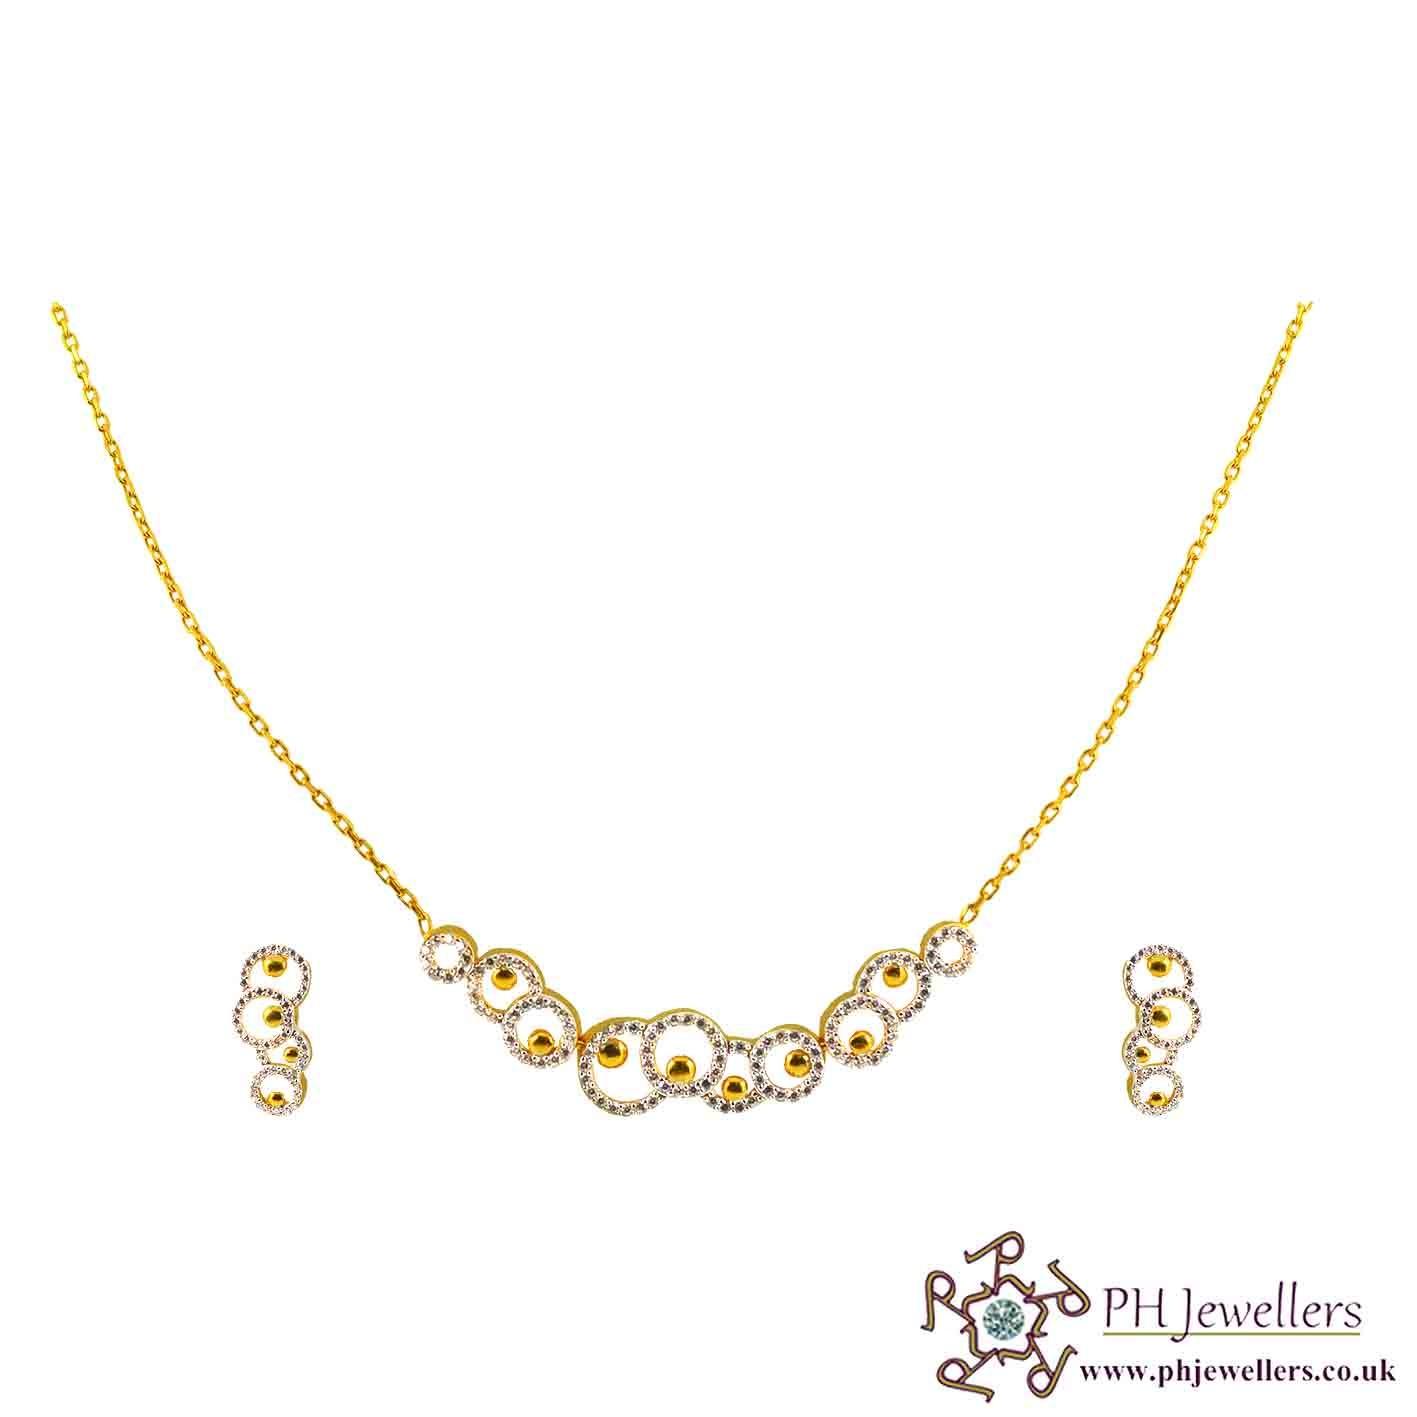 22ct 916 Hallmark Yellow Gold Necklace Set CZ NCK2